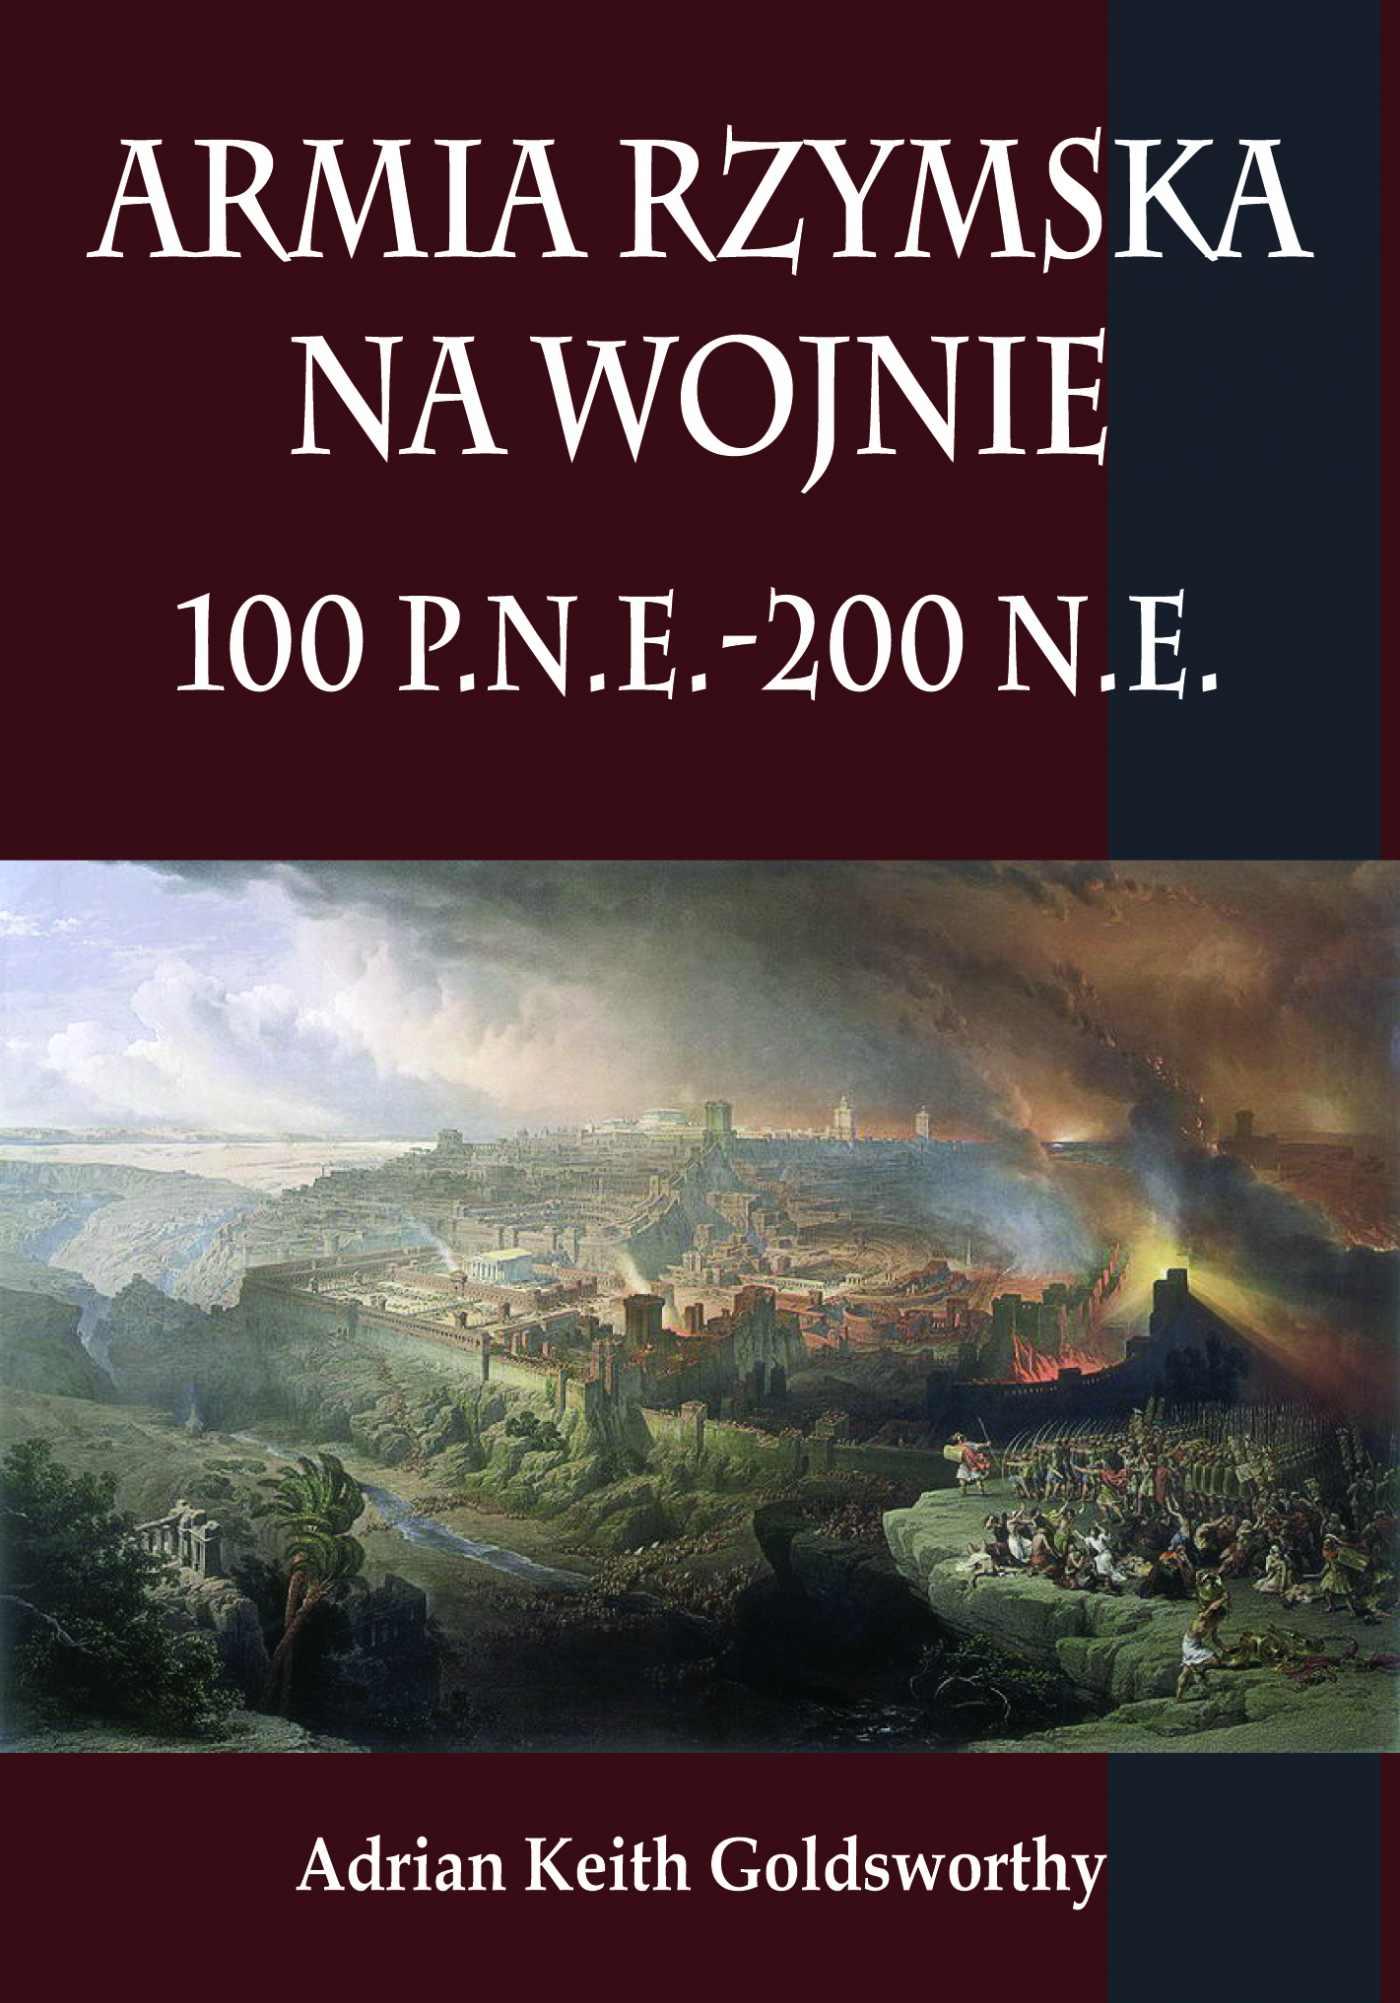 Armia rzymska na wojnie 100 p.n.e.-200 n.e - Ebook (Książka na Kindle) do pobrania w formacie MOBI